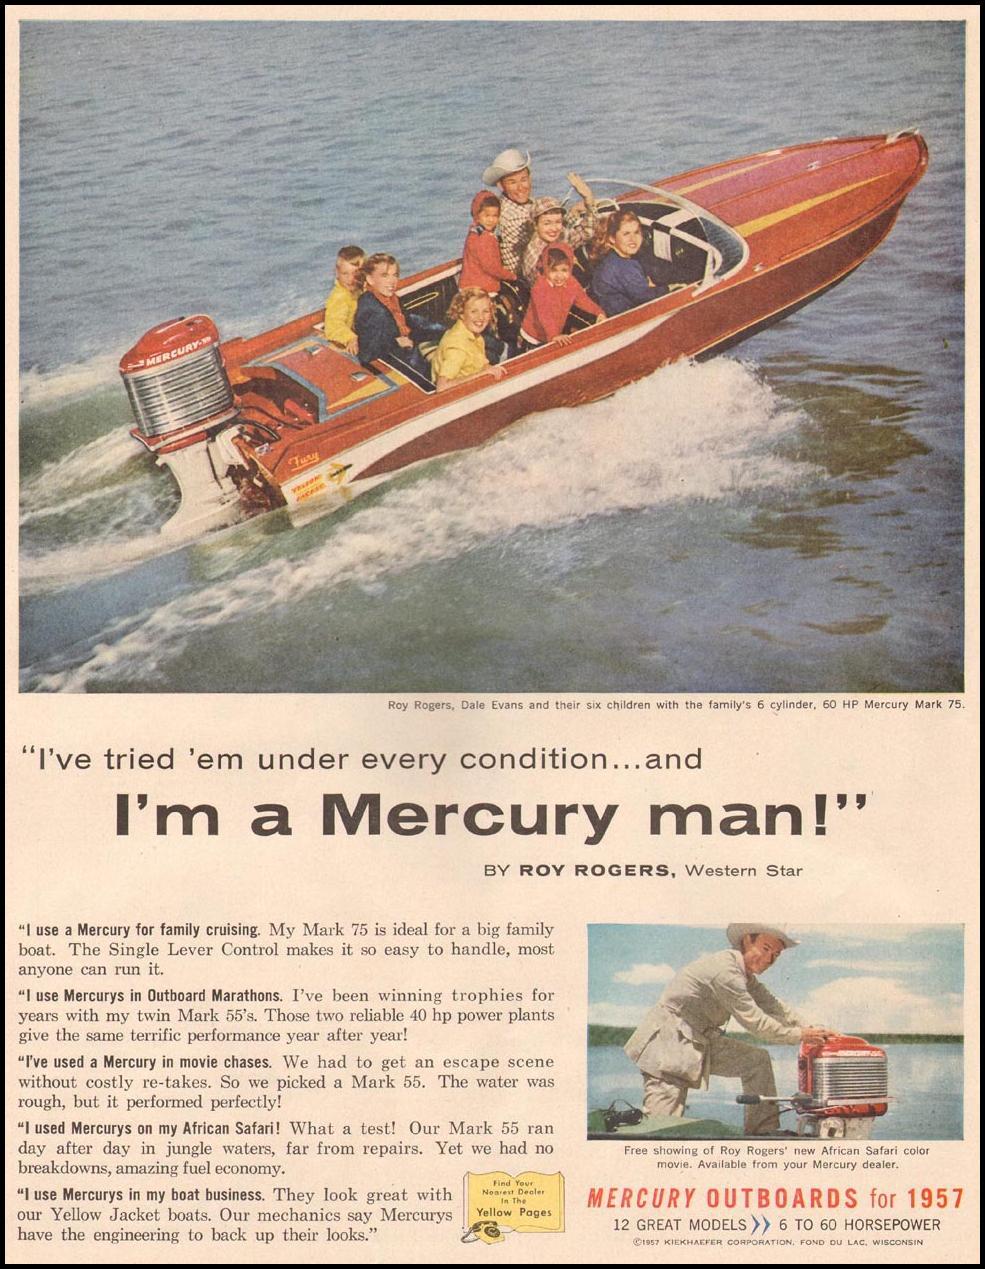 MERCURY OUTBOARD BOAT MOTORS LIFE 06/24/1957 p. 56